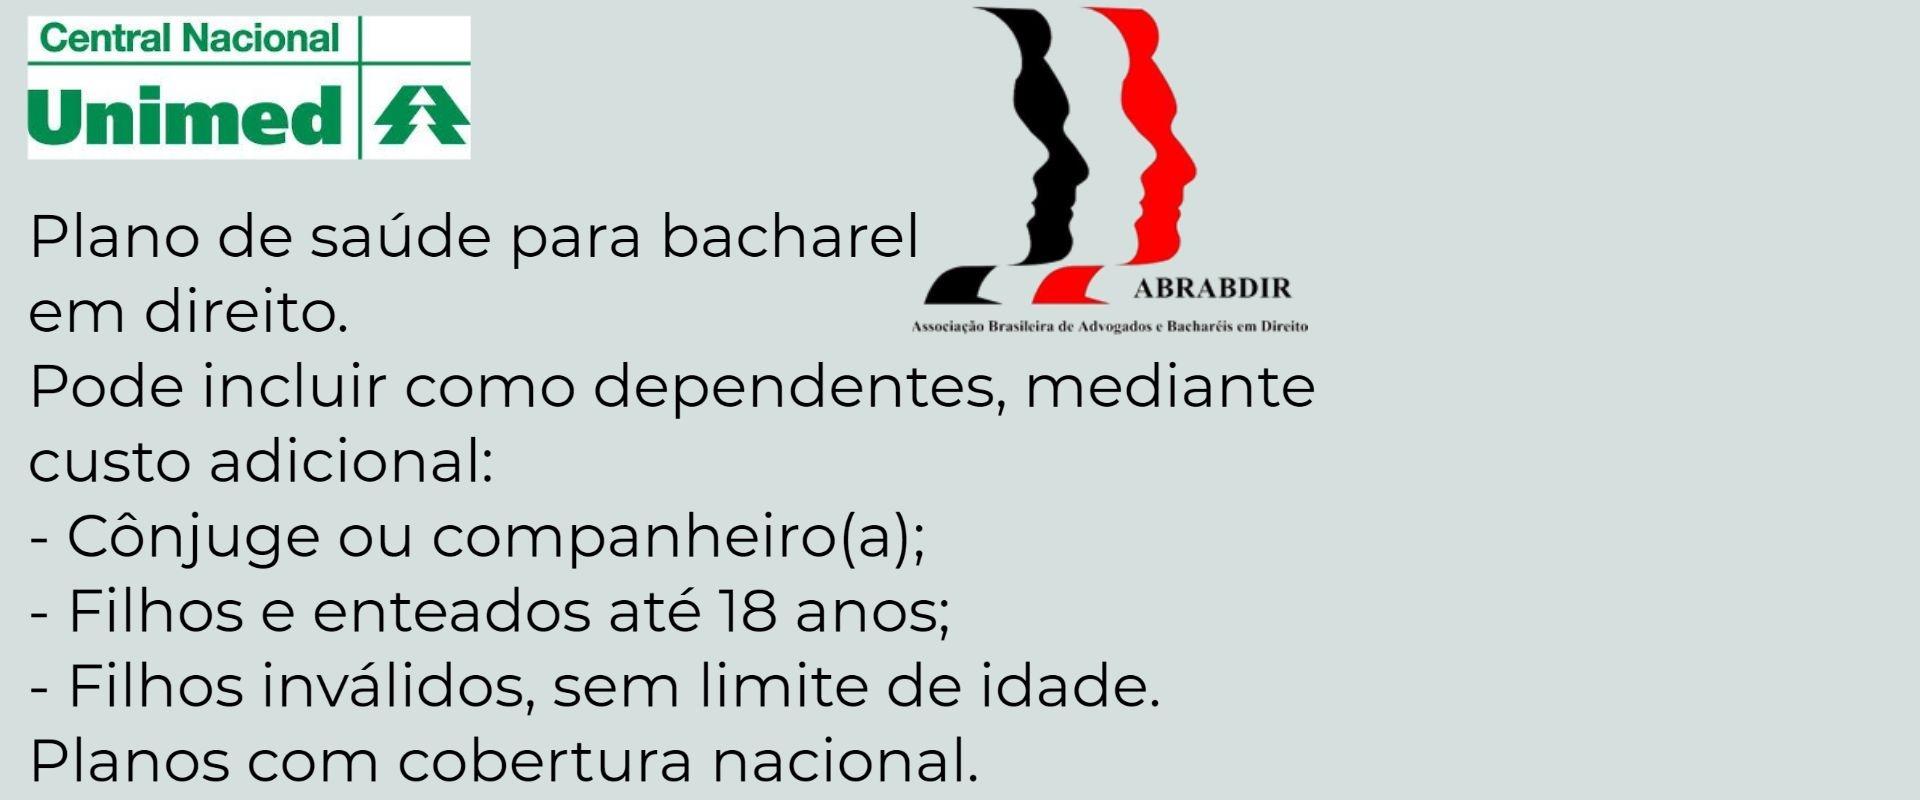 Unimed ABRABDIR Itatiba